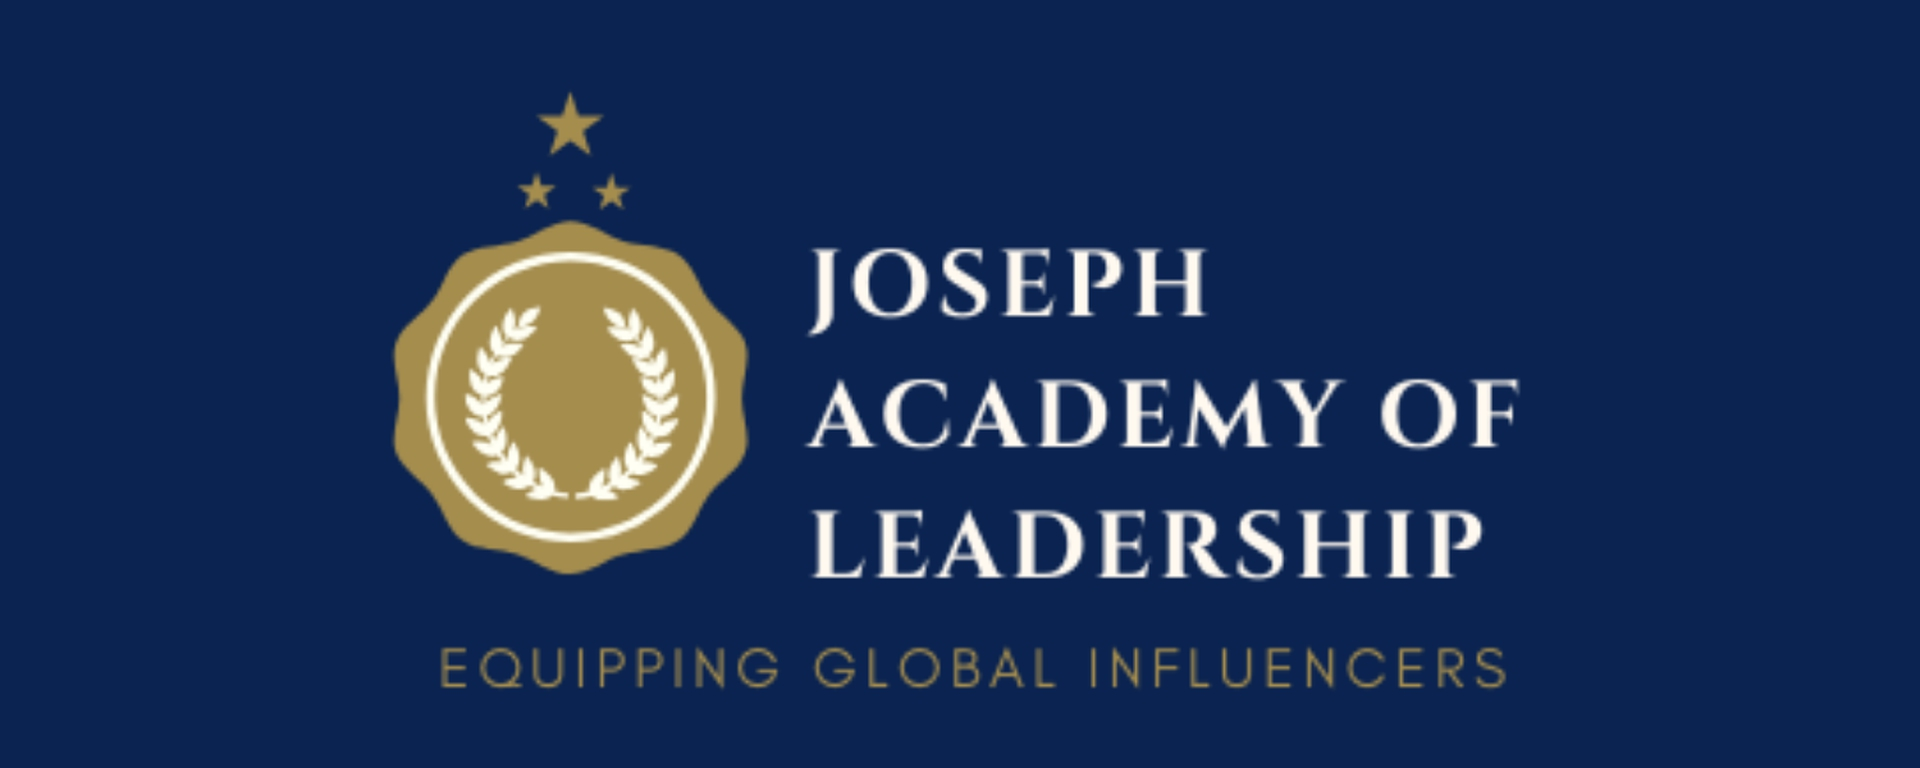 Pursue Your Purpose LLC - The Joseph Academy of Leadership Movemeback African initiative cover image